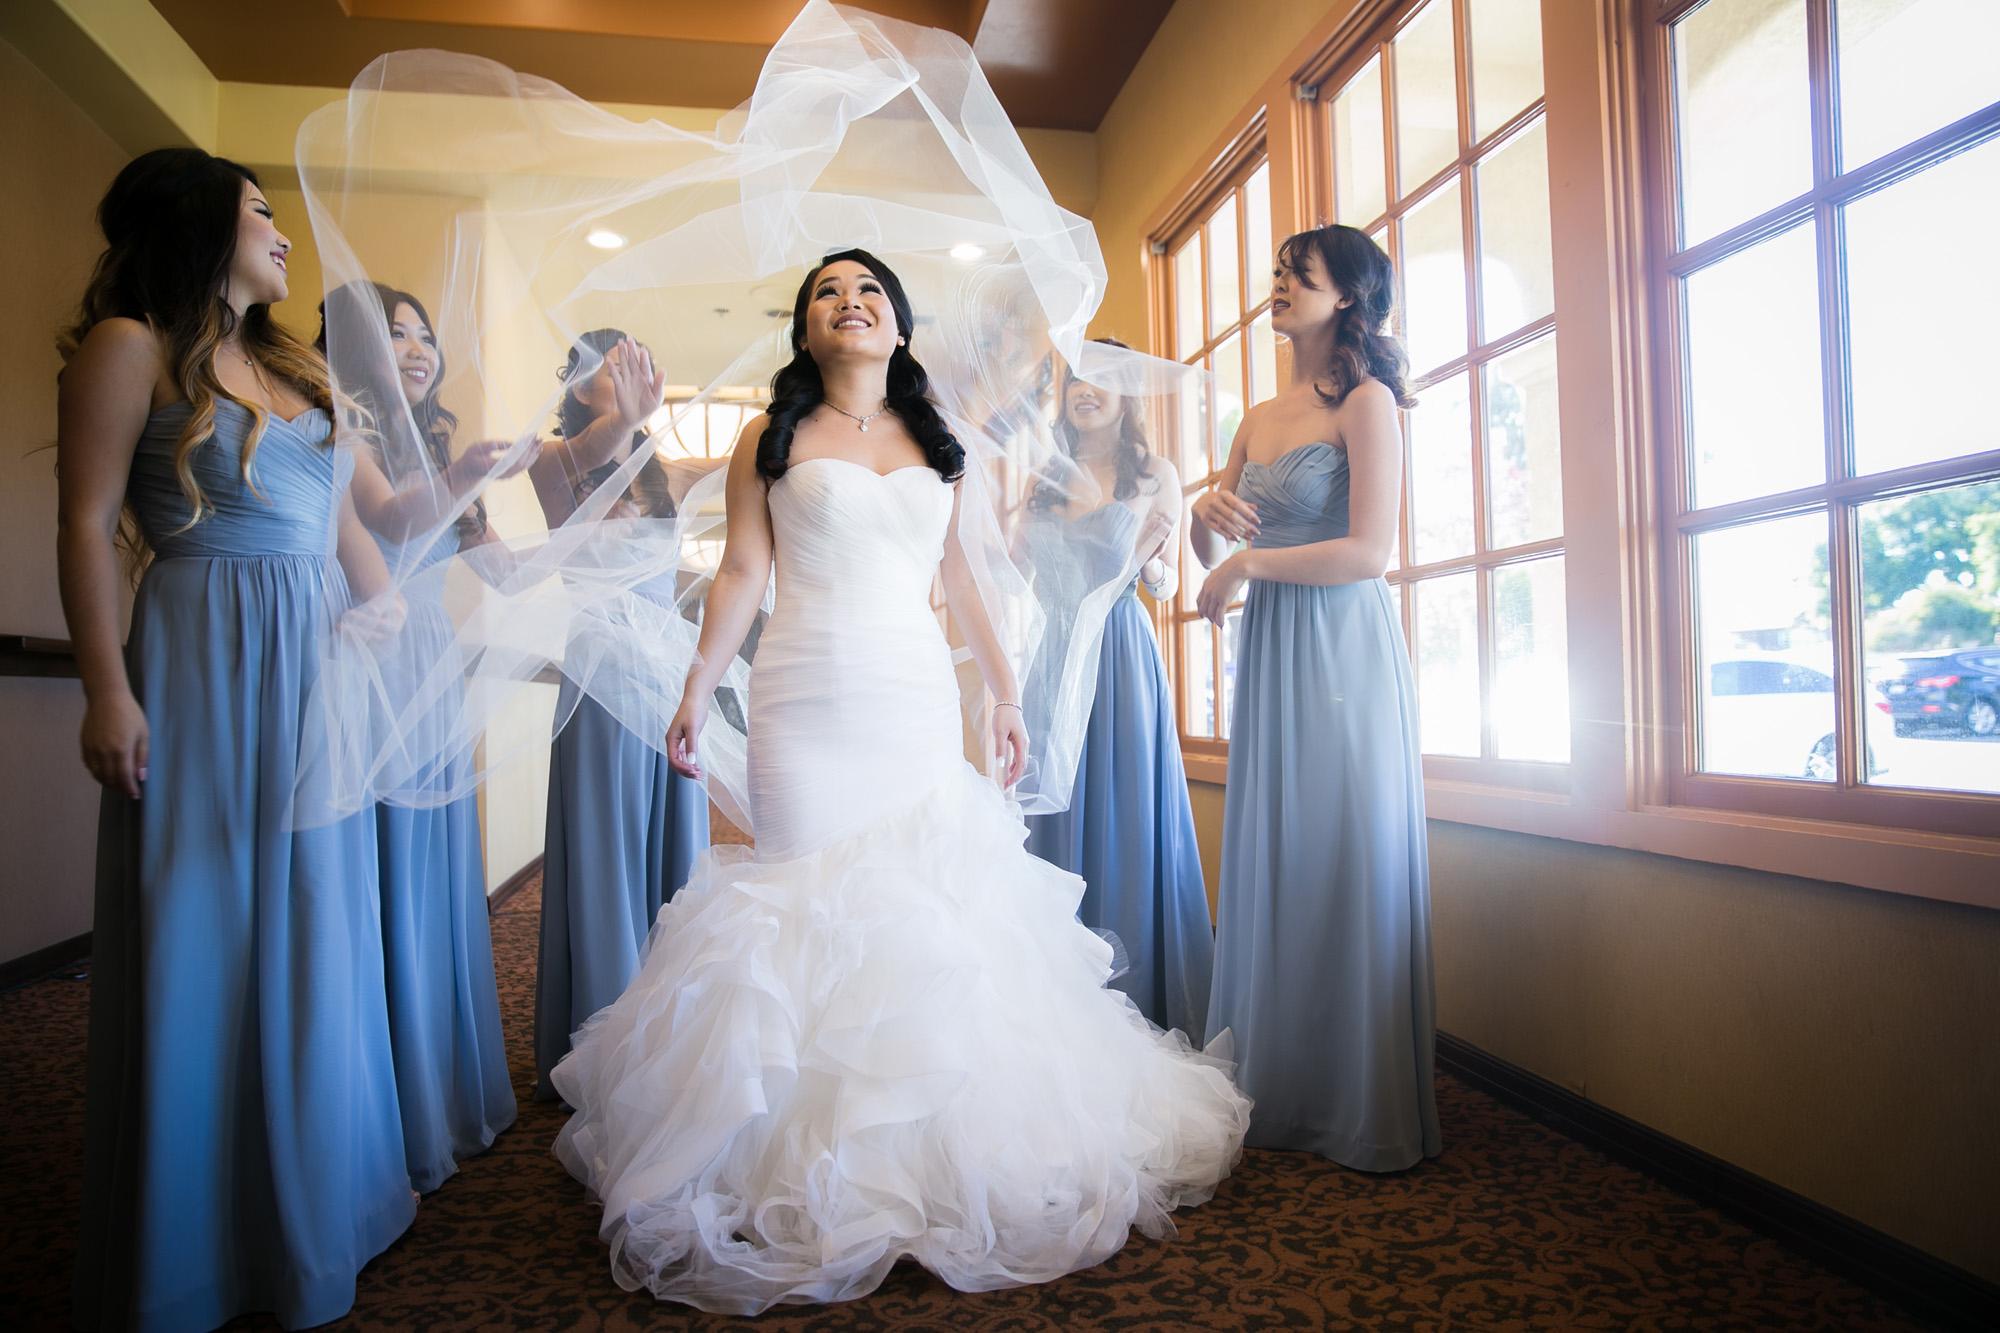 Geoff Kowalchuk JT Wedding Photo-009.jpg